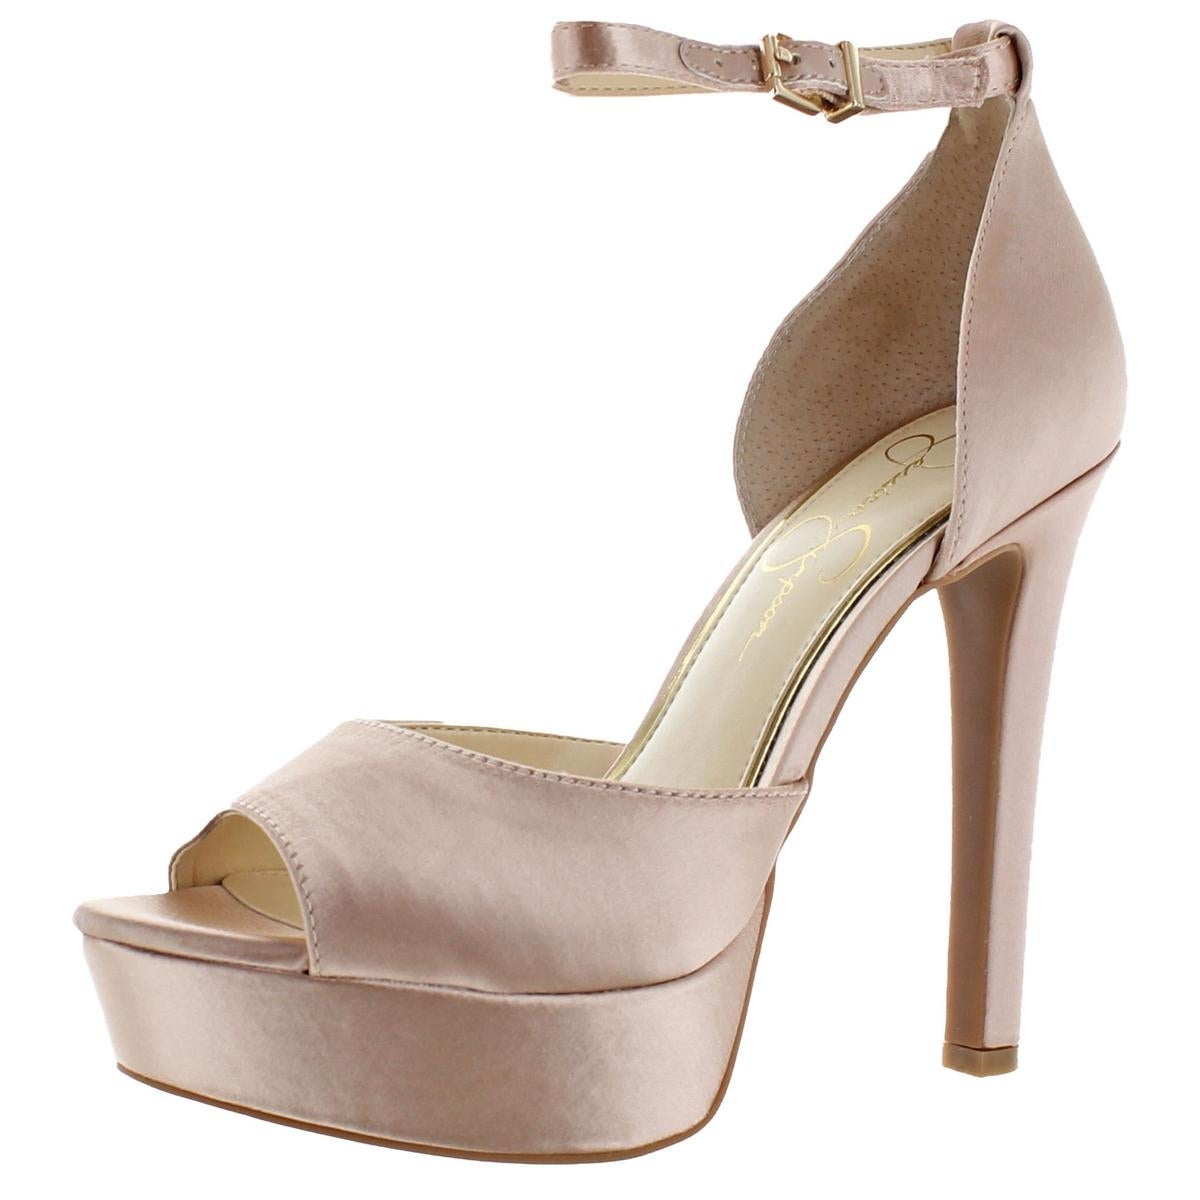 c1413288b576 Shop Jessica Simpson Womens Beeya Heels Padded Insole - Free ...